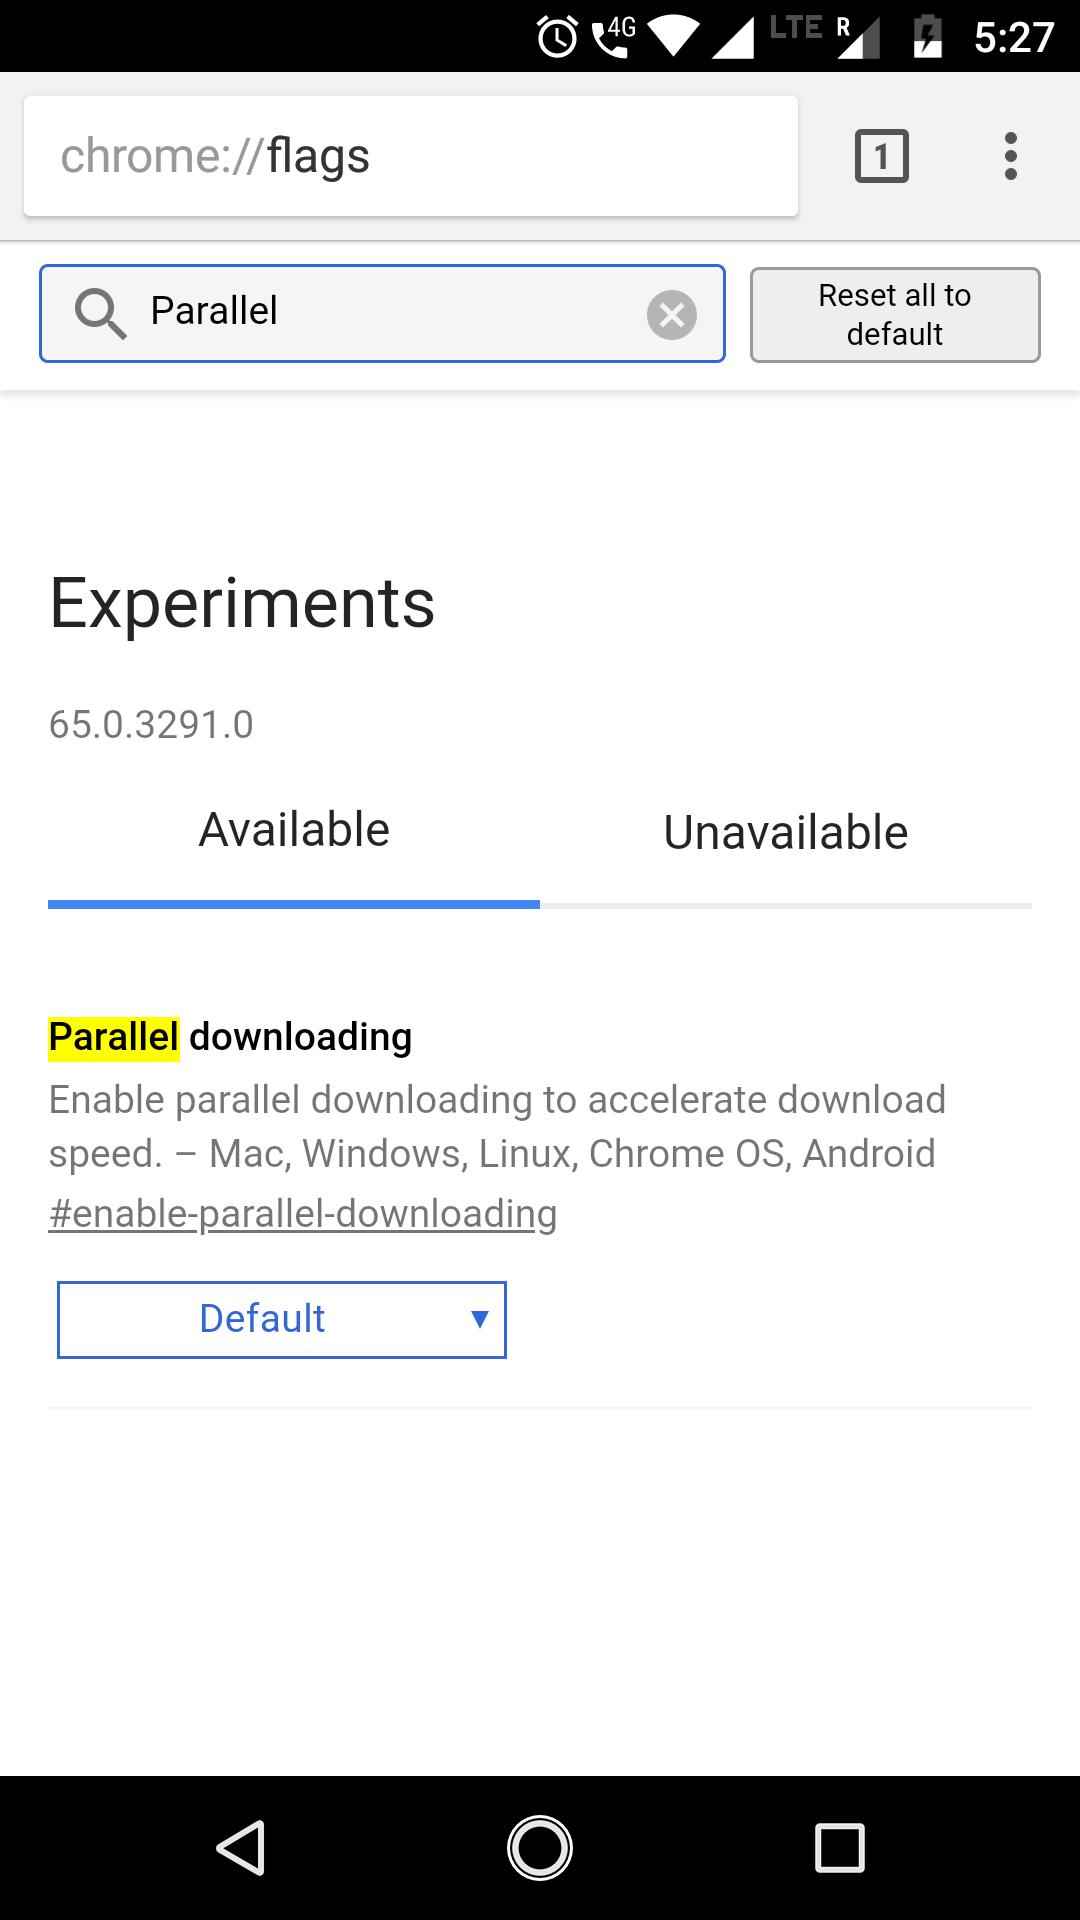 afossbytes.com_wp_content_uploads_2017_12_Google_Chrome_Parallel_Downloading_1.